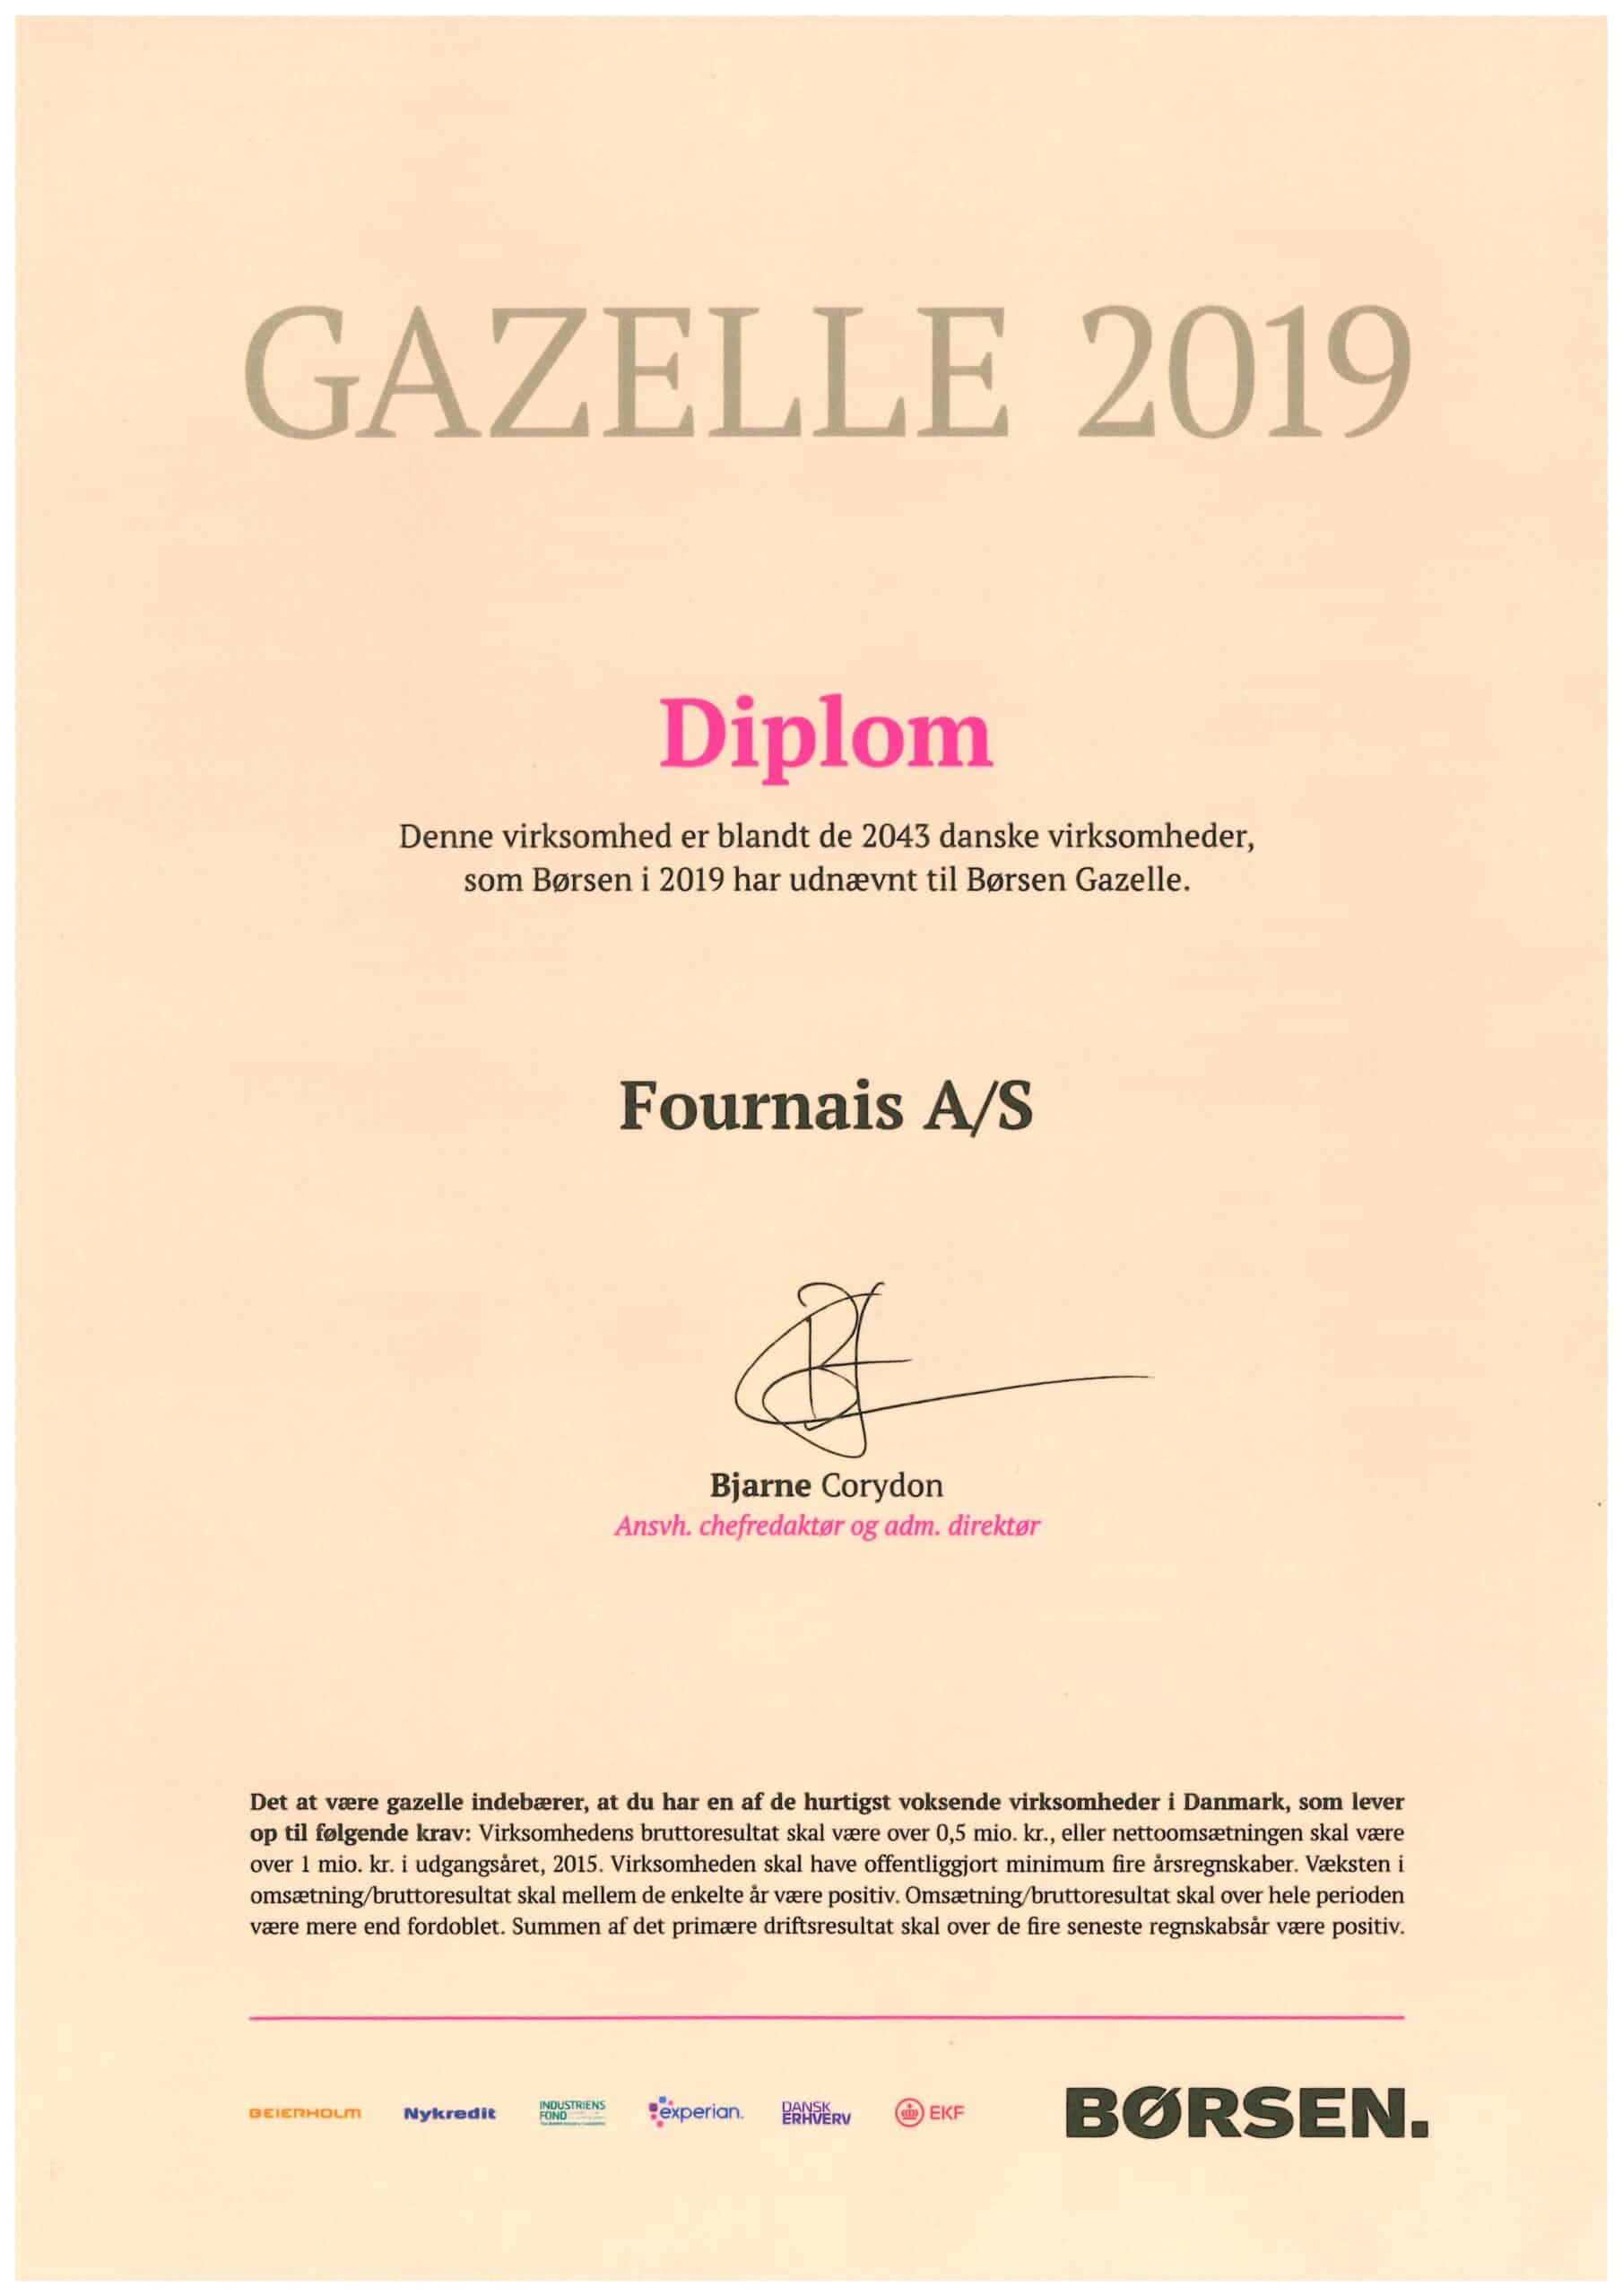 Gazelle 2019